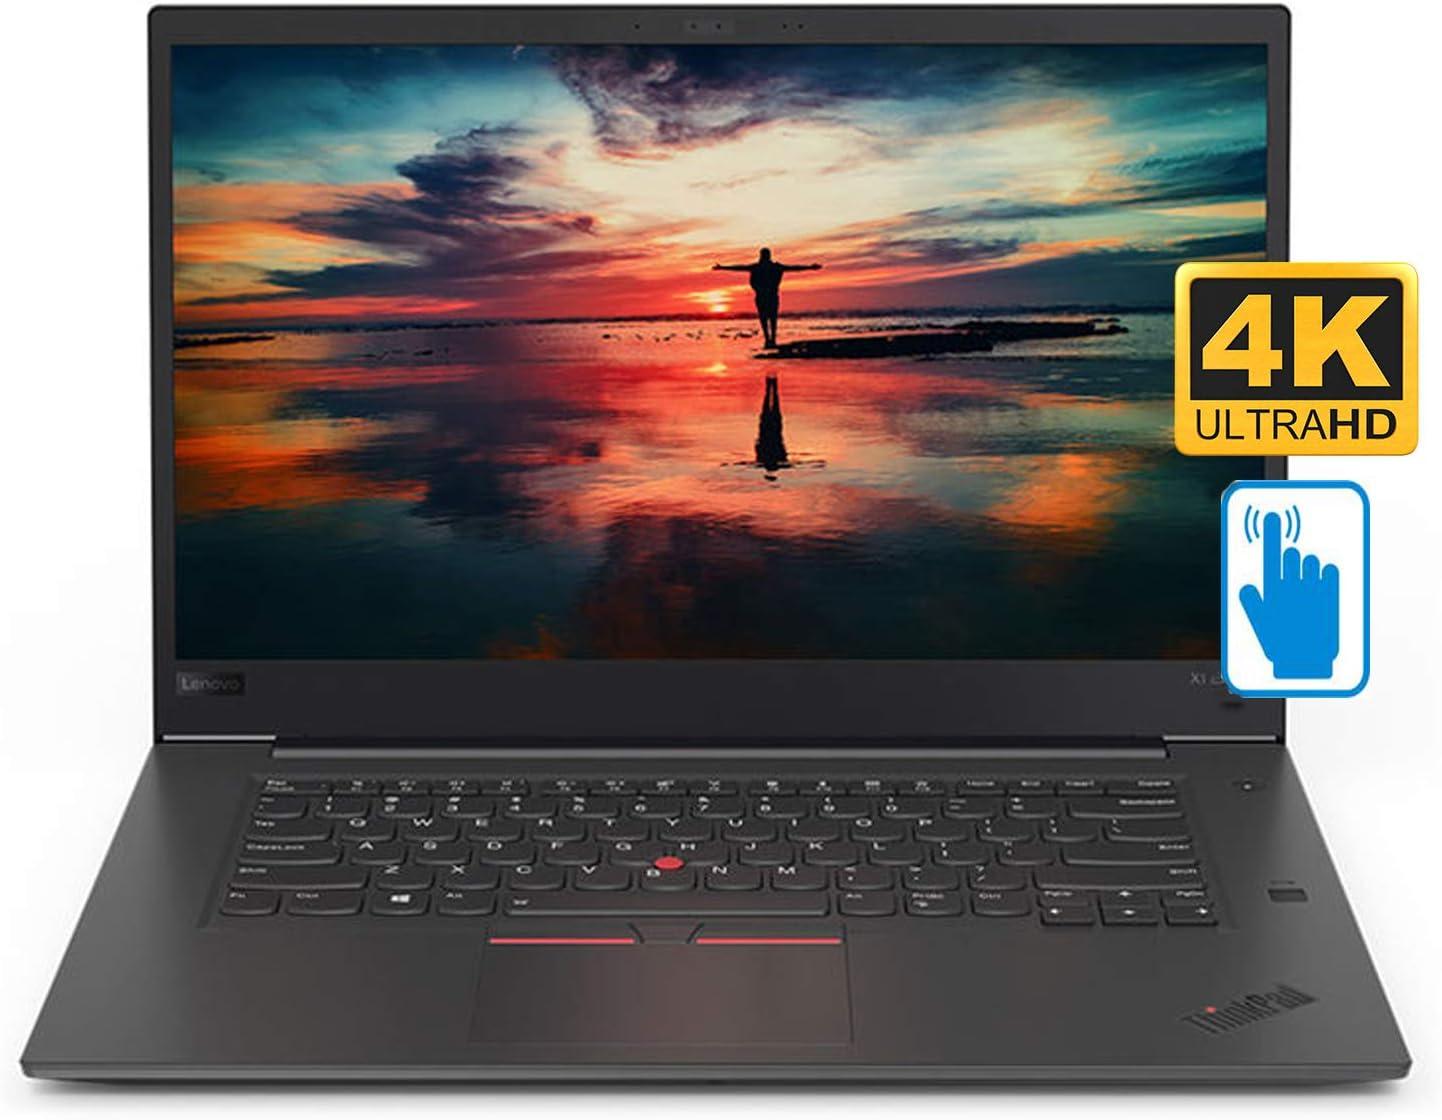 Lenovo ThinkPad X1 Extreme Premium Home and Business Laptop (Intel 8th Gen i7-8850H 6-Core, vPro, 32GB RAM, 1TB PCIe SSD, 15.6